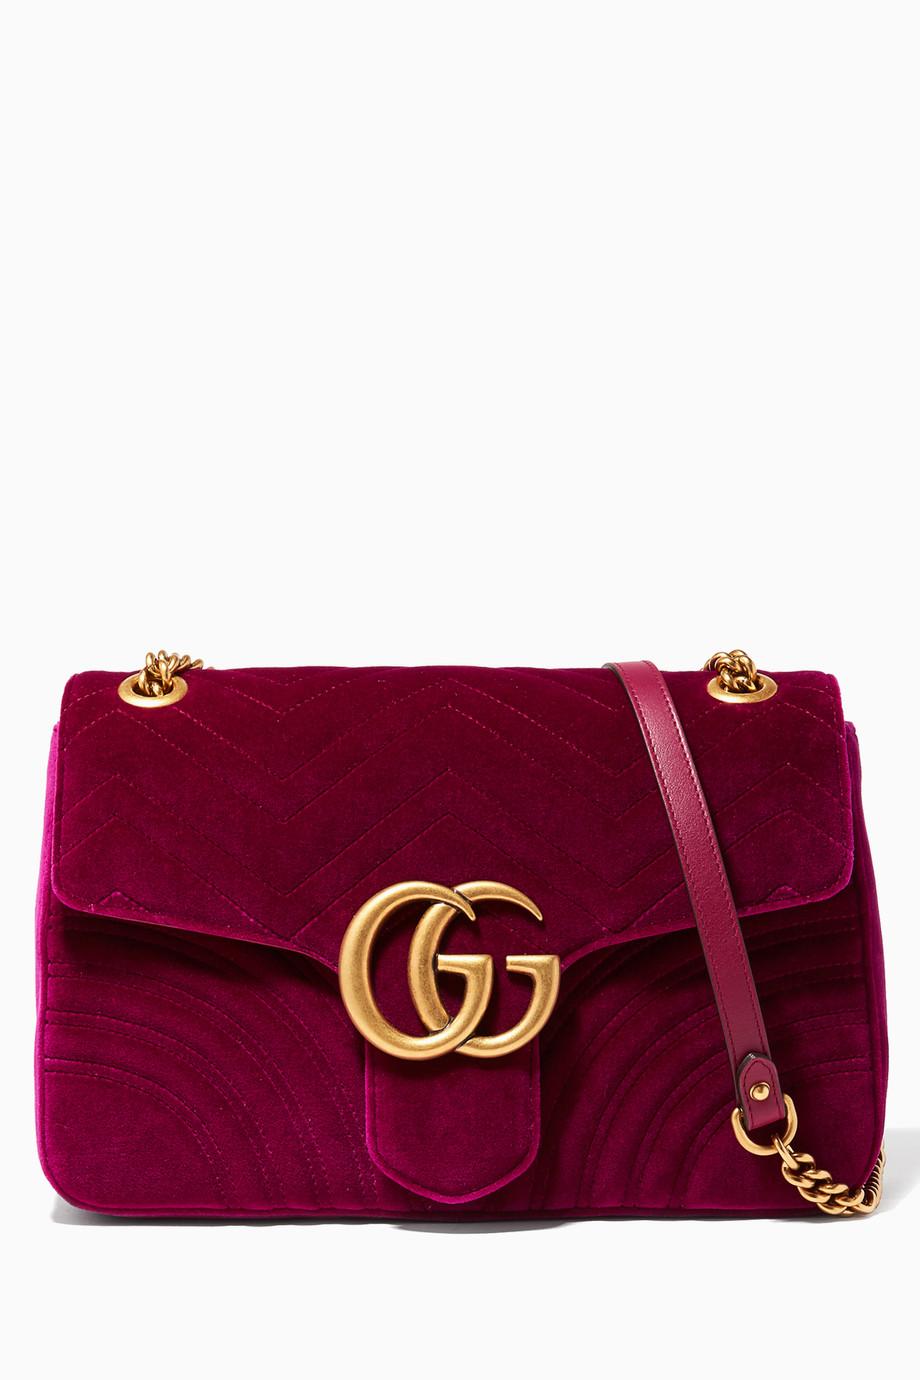 4133d8498a38 Shop Gucci Pink Fuchsia GG Marmont 2.0 Velvet Quilted Medium ...